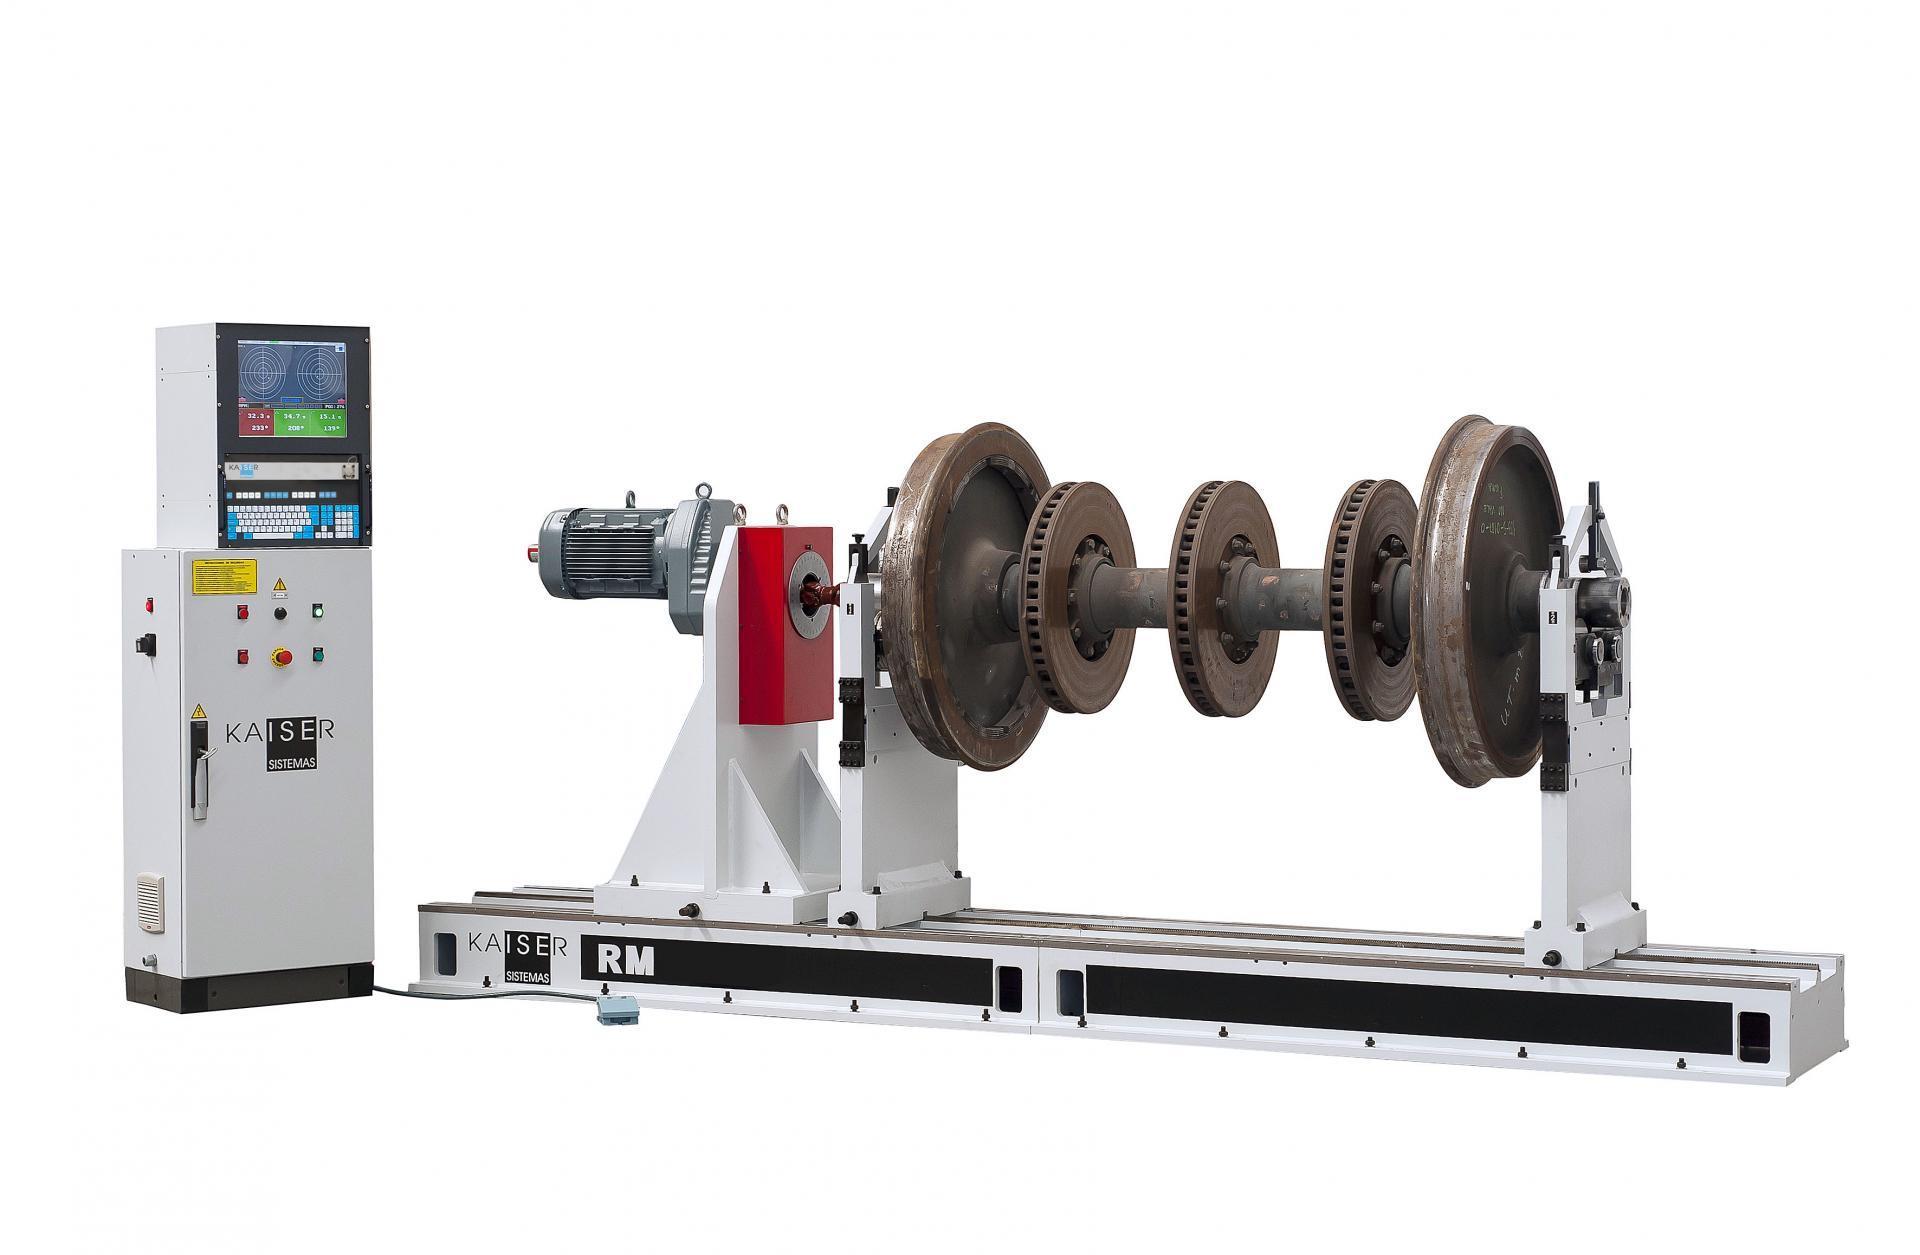 REF 12 - MODEL RM3000-4500.2 HORIZONTAL BALANCING MACHINE